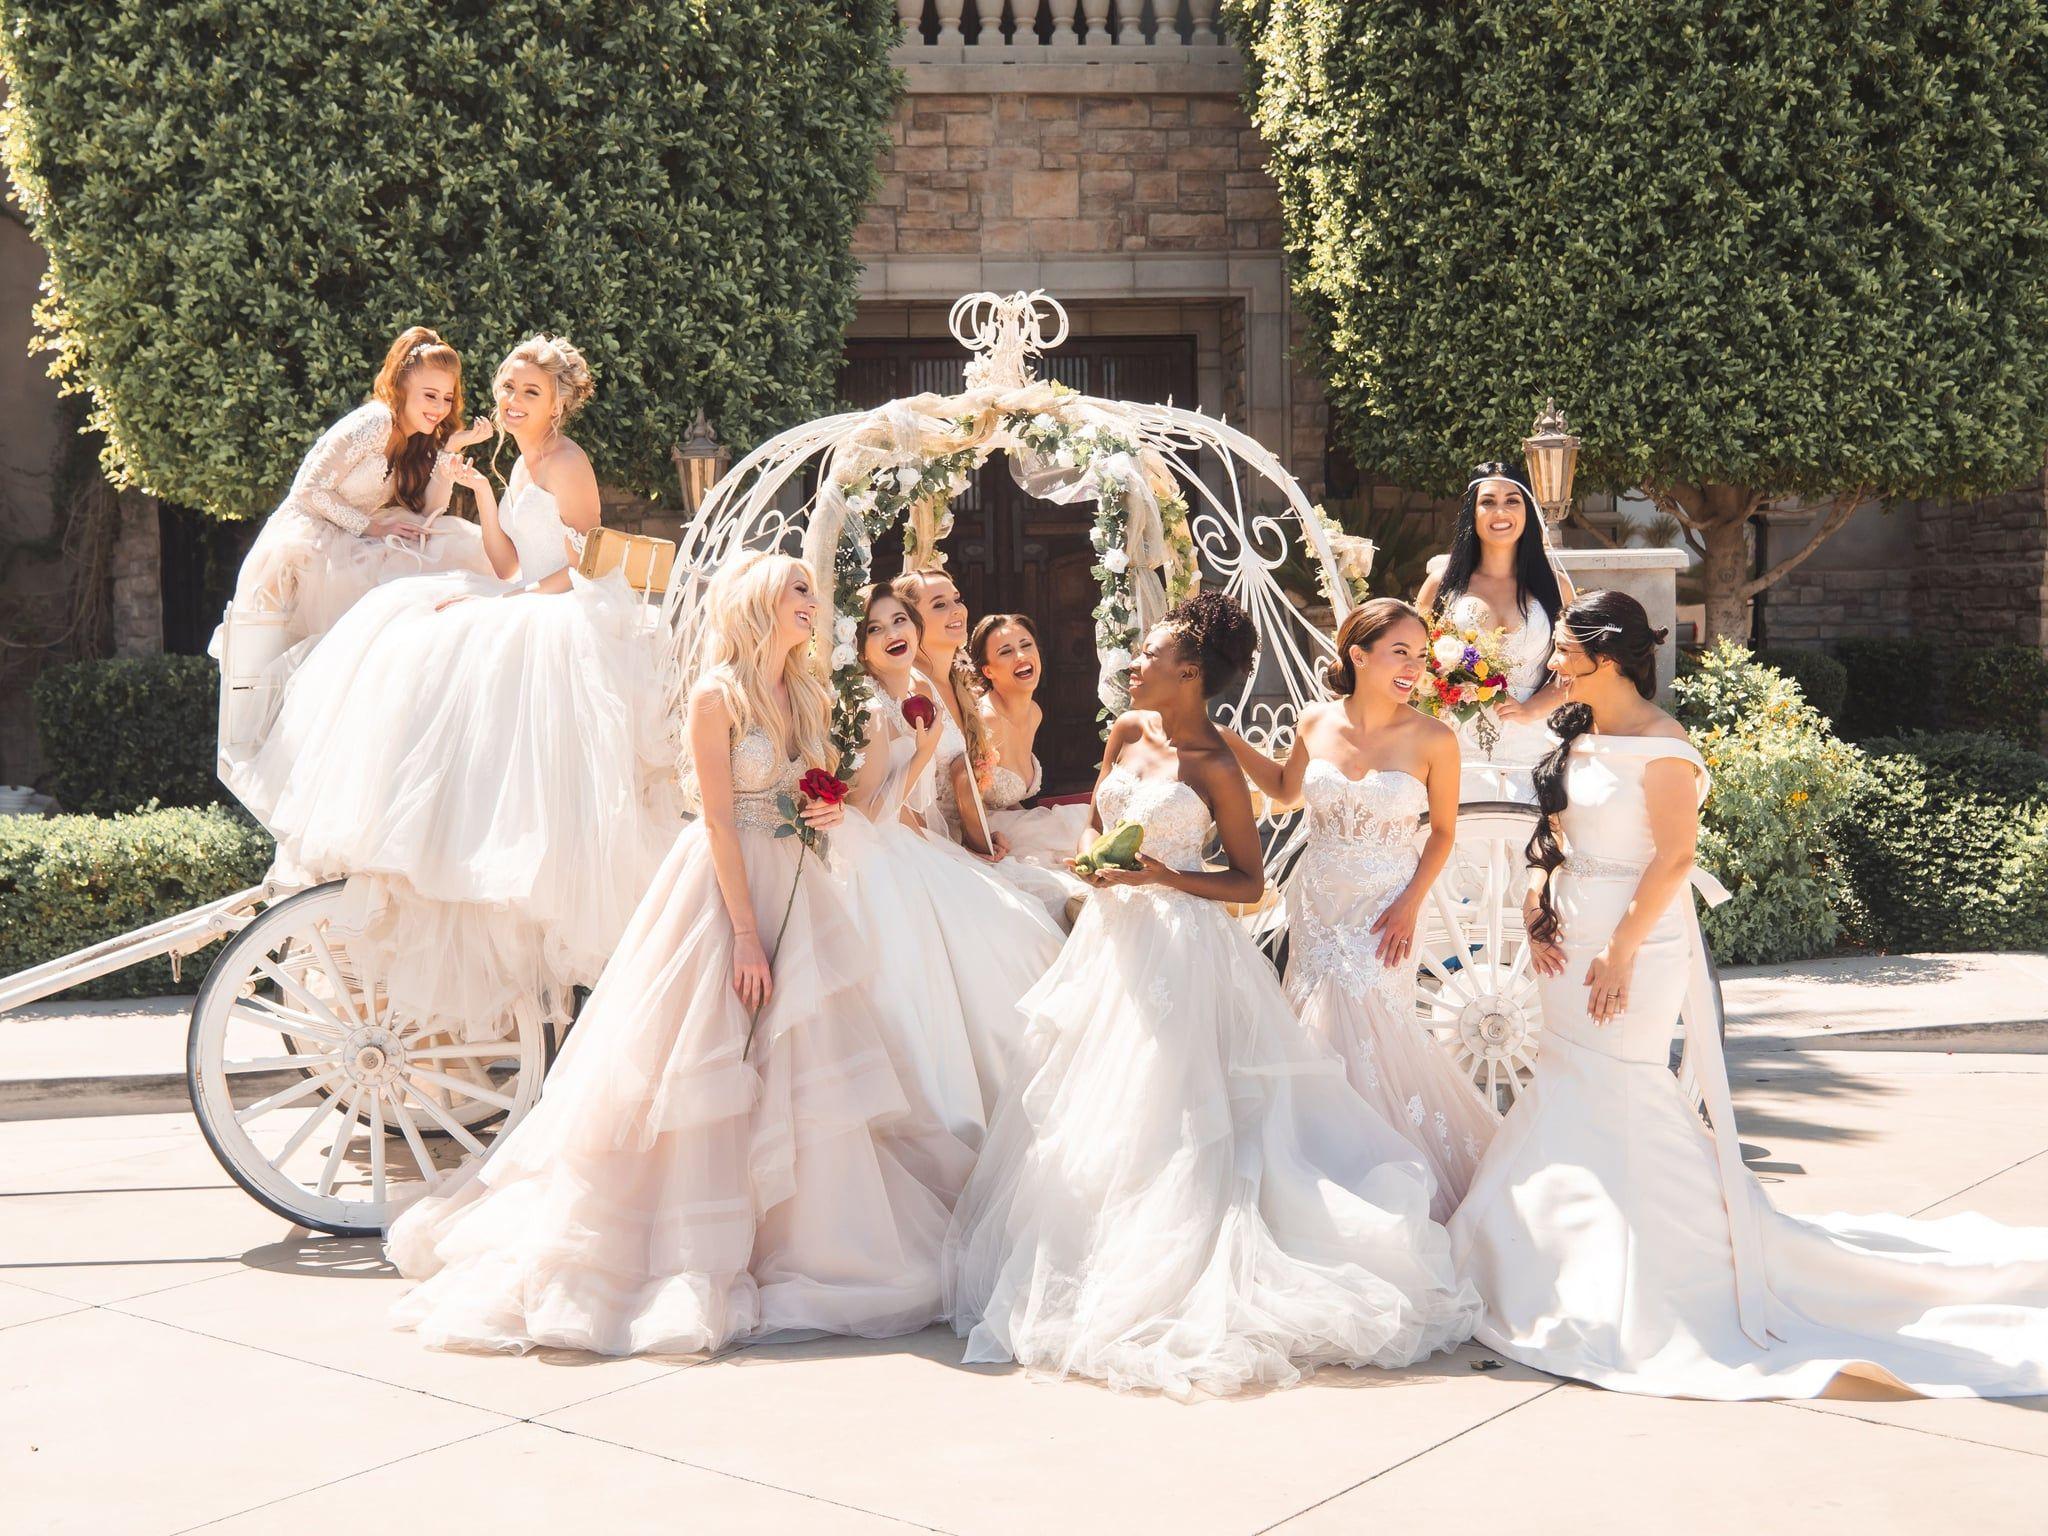 Bippity Boppity Boo This Disney Princess Wedding Is A Dream Come True Princess Wedding Theme Disney Wedding Theme Princess Bride Wedding [ 1536 x 2048 Pixel ]